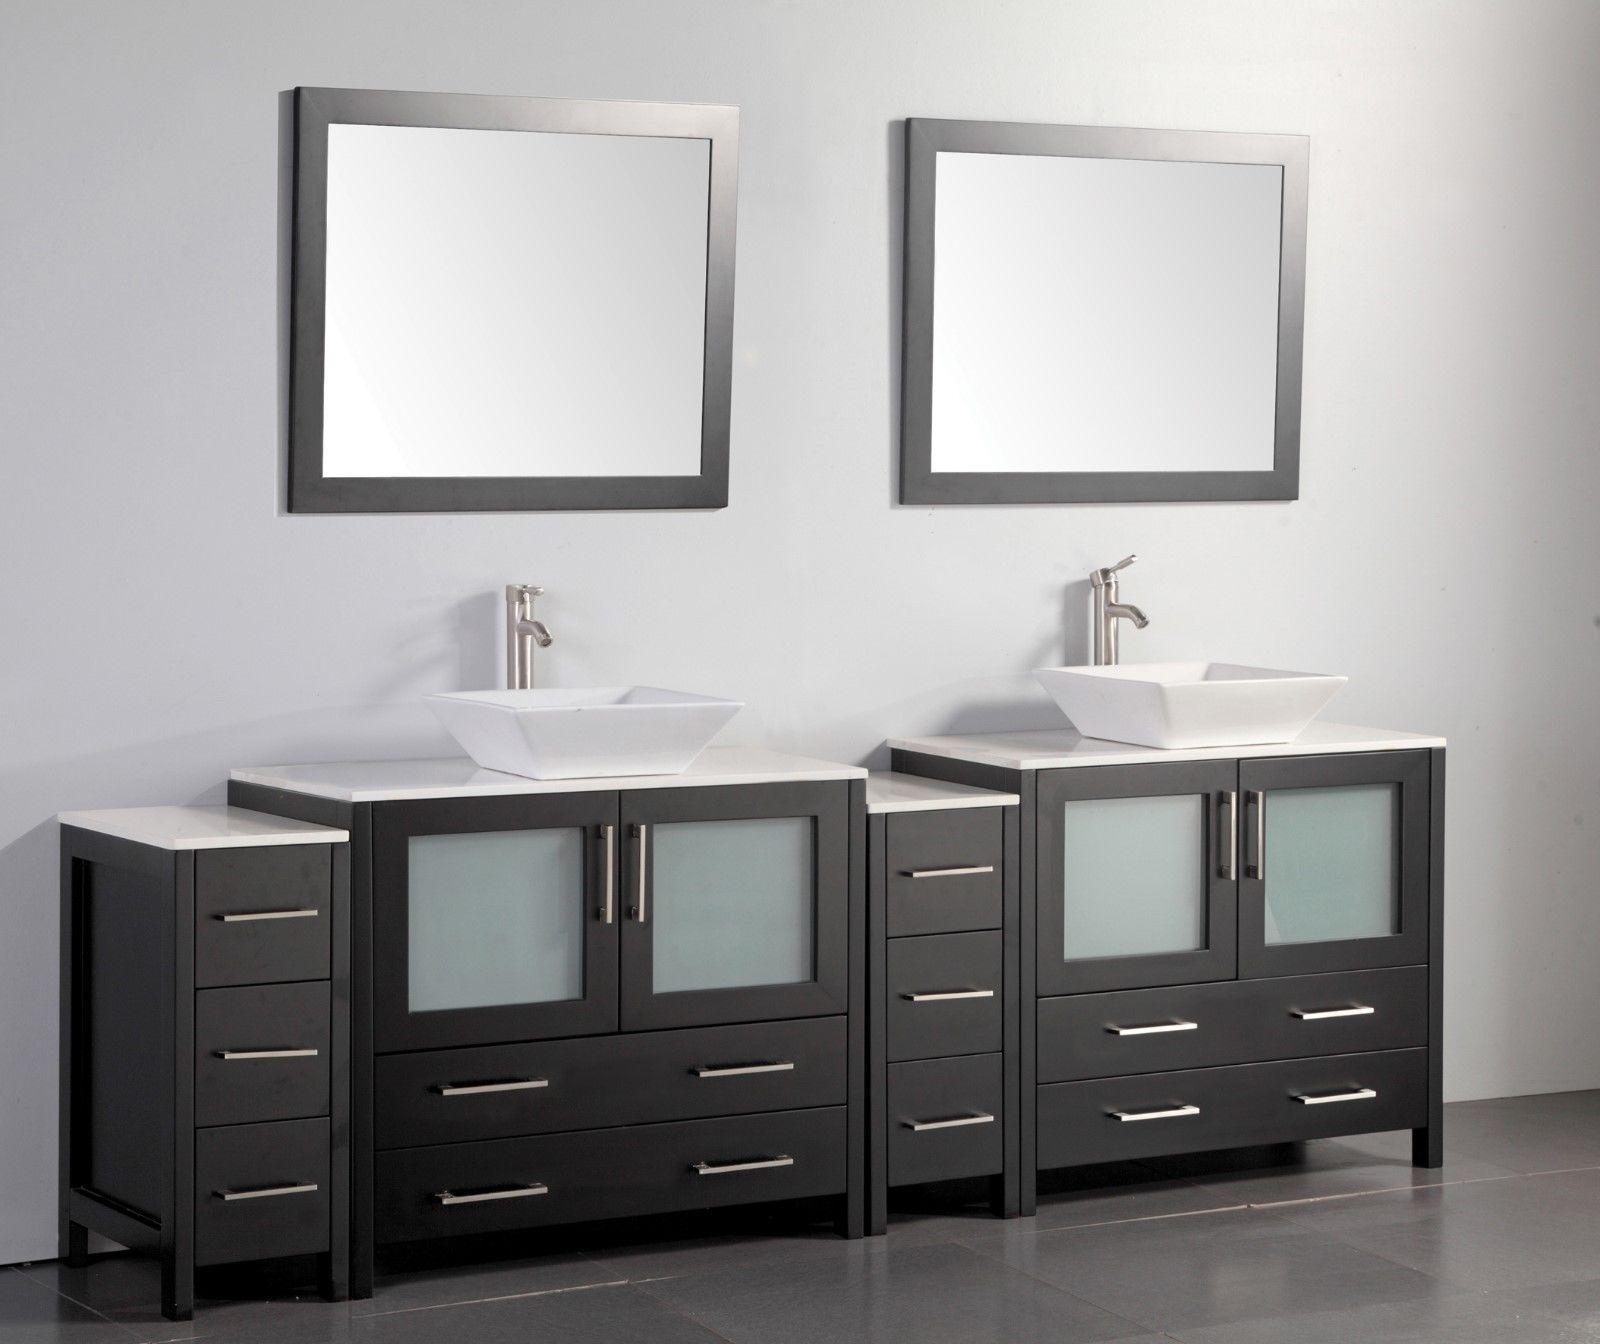 Vanity Art 96 Inch Double Sink Bathroom Vanity Set With